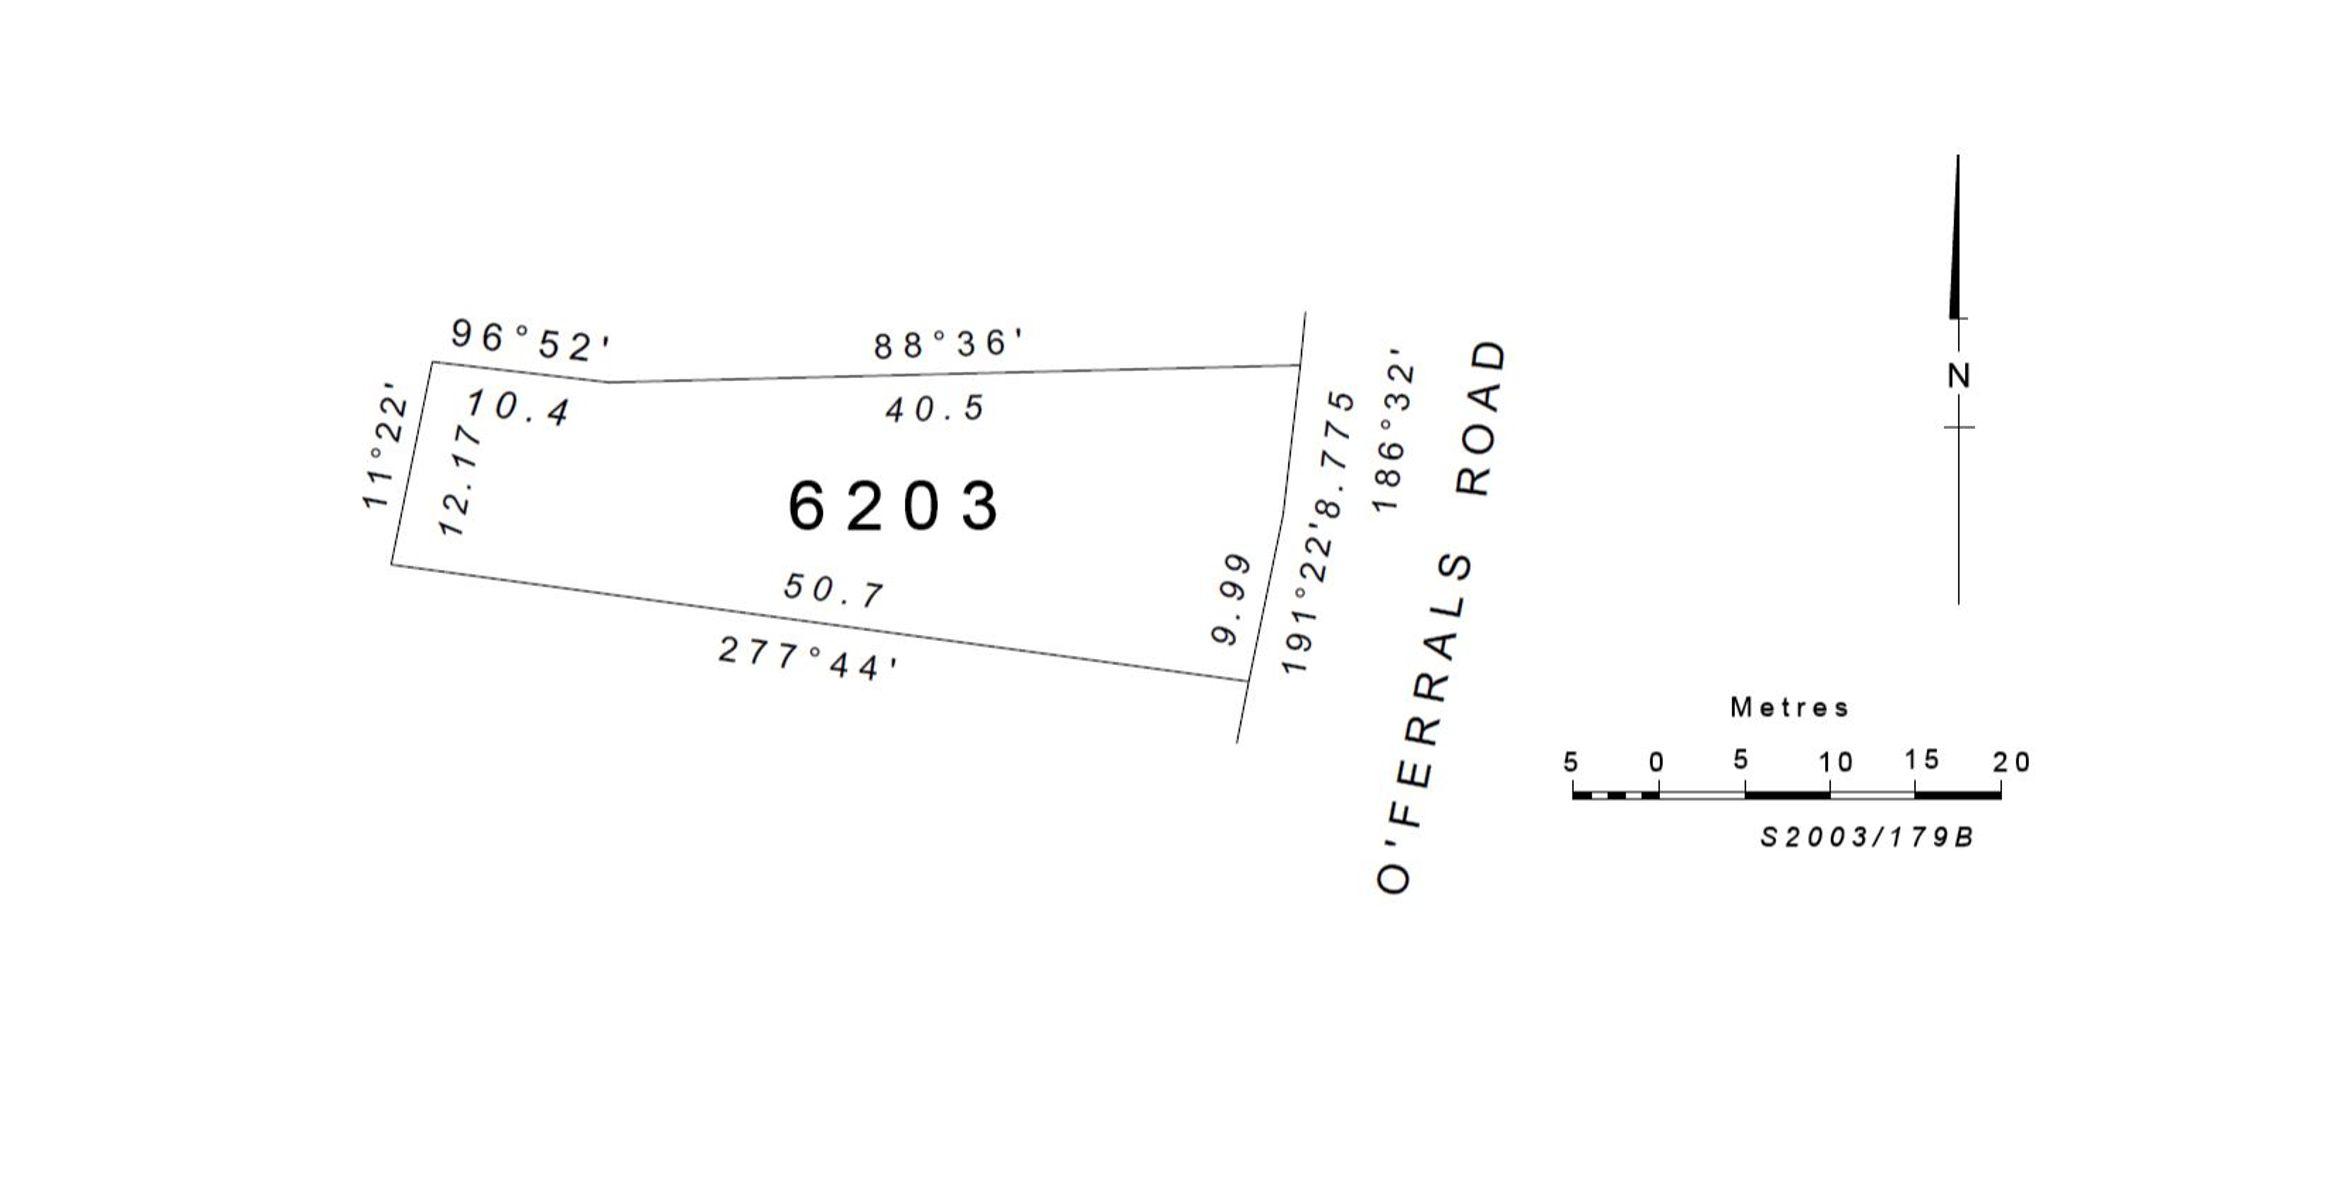 66 O'Ferrals Road, Bayview, NT 0820